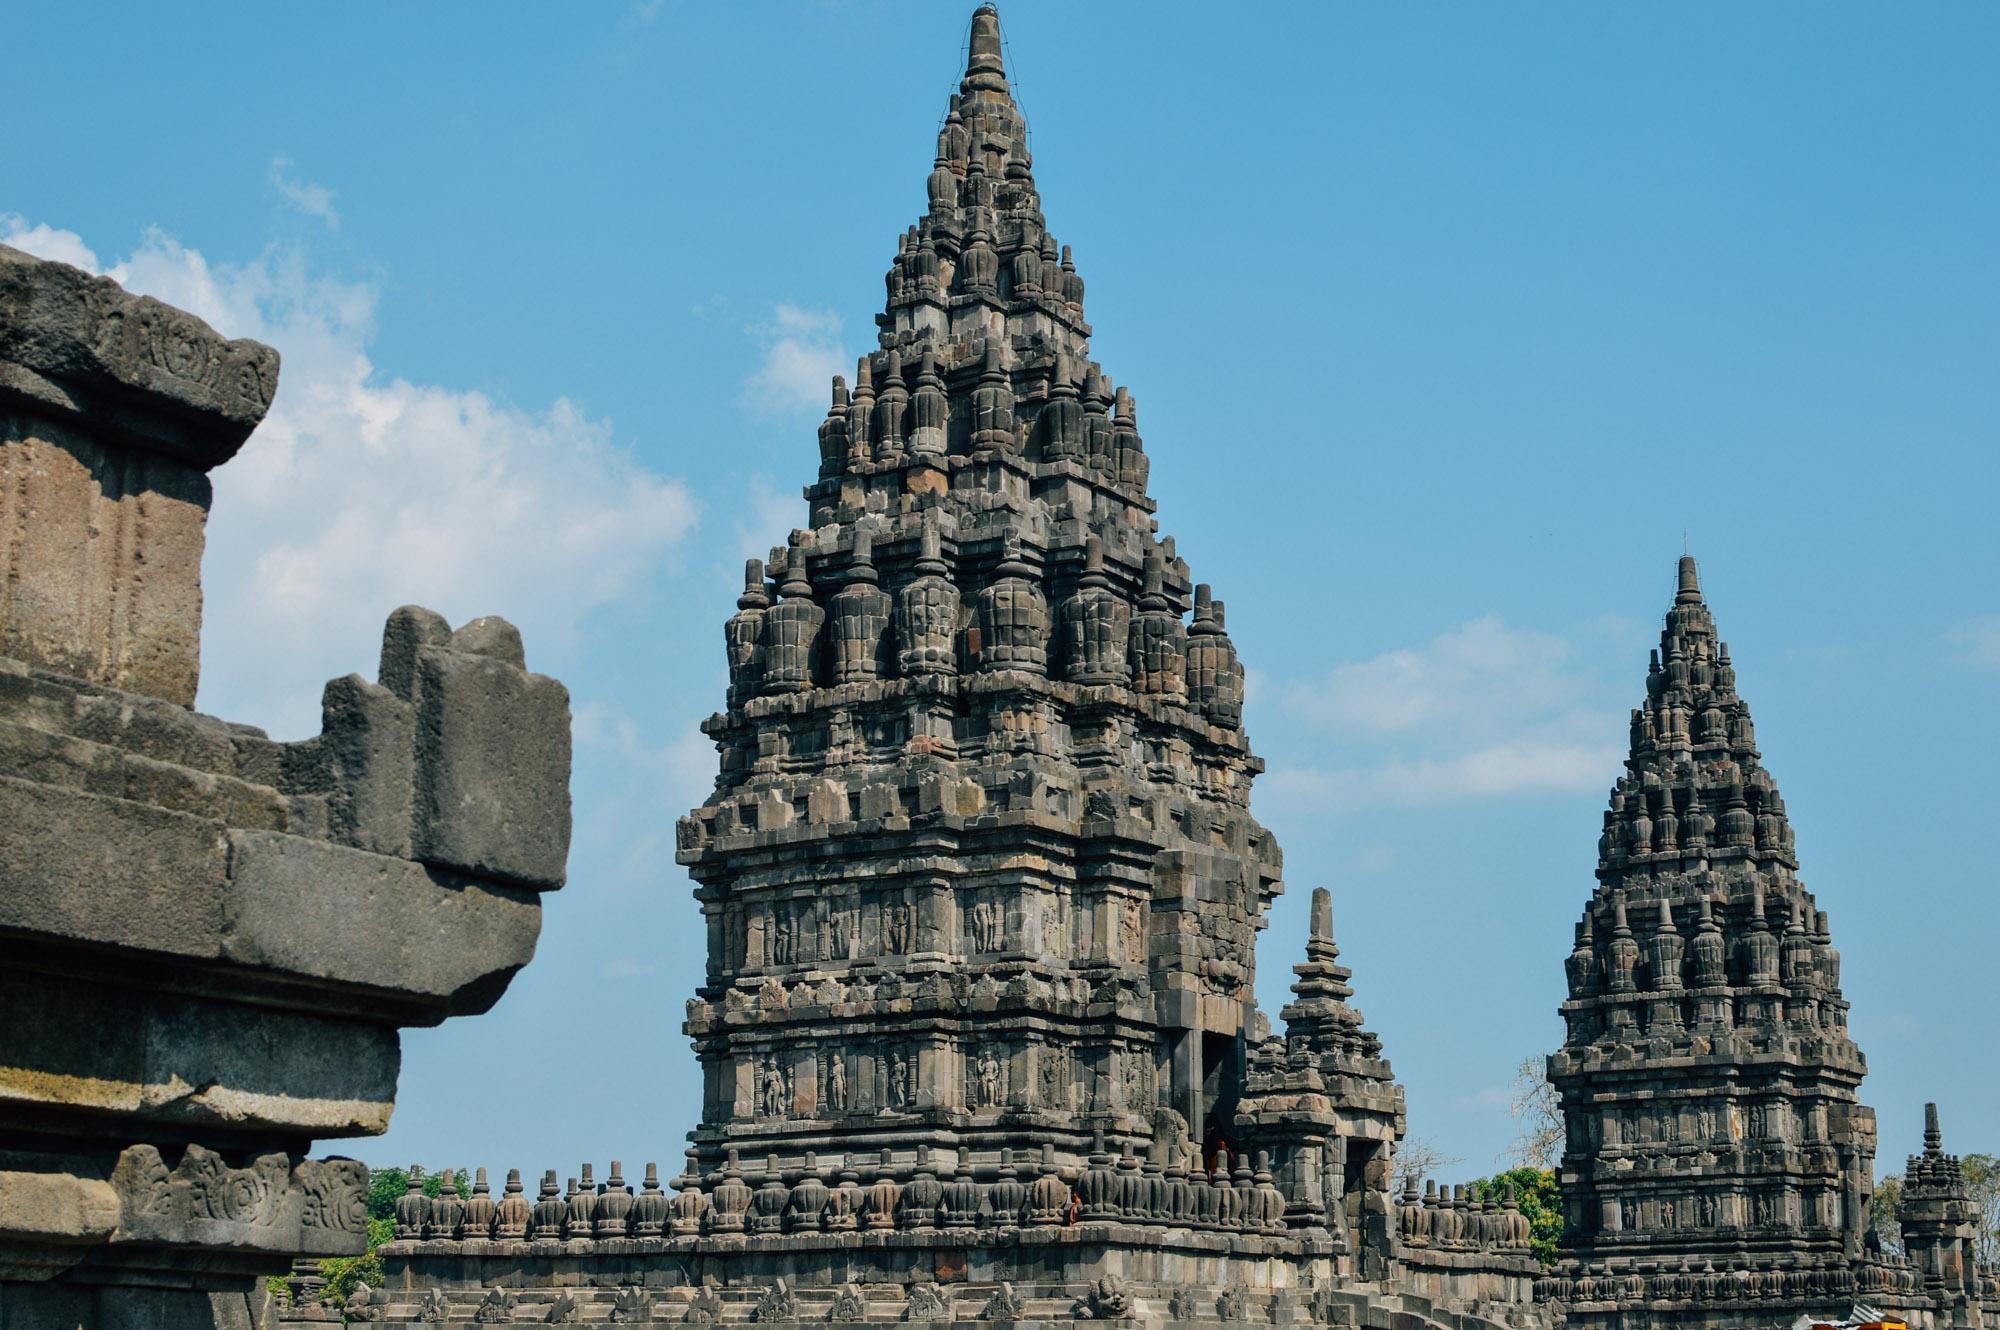 prambanan 3 - Jogyakarta with Temples